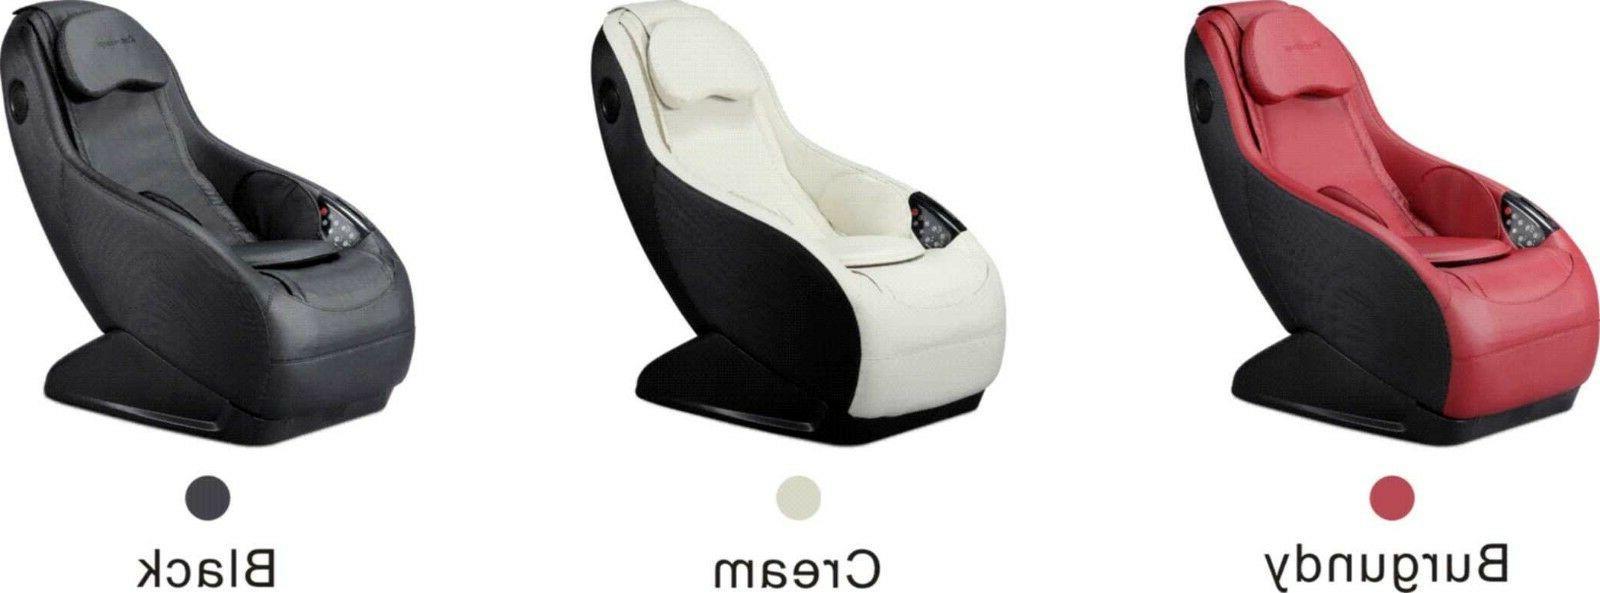 BestMassage Massage Chair Bluetooth Audio Long